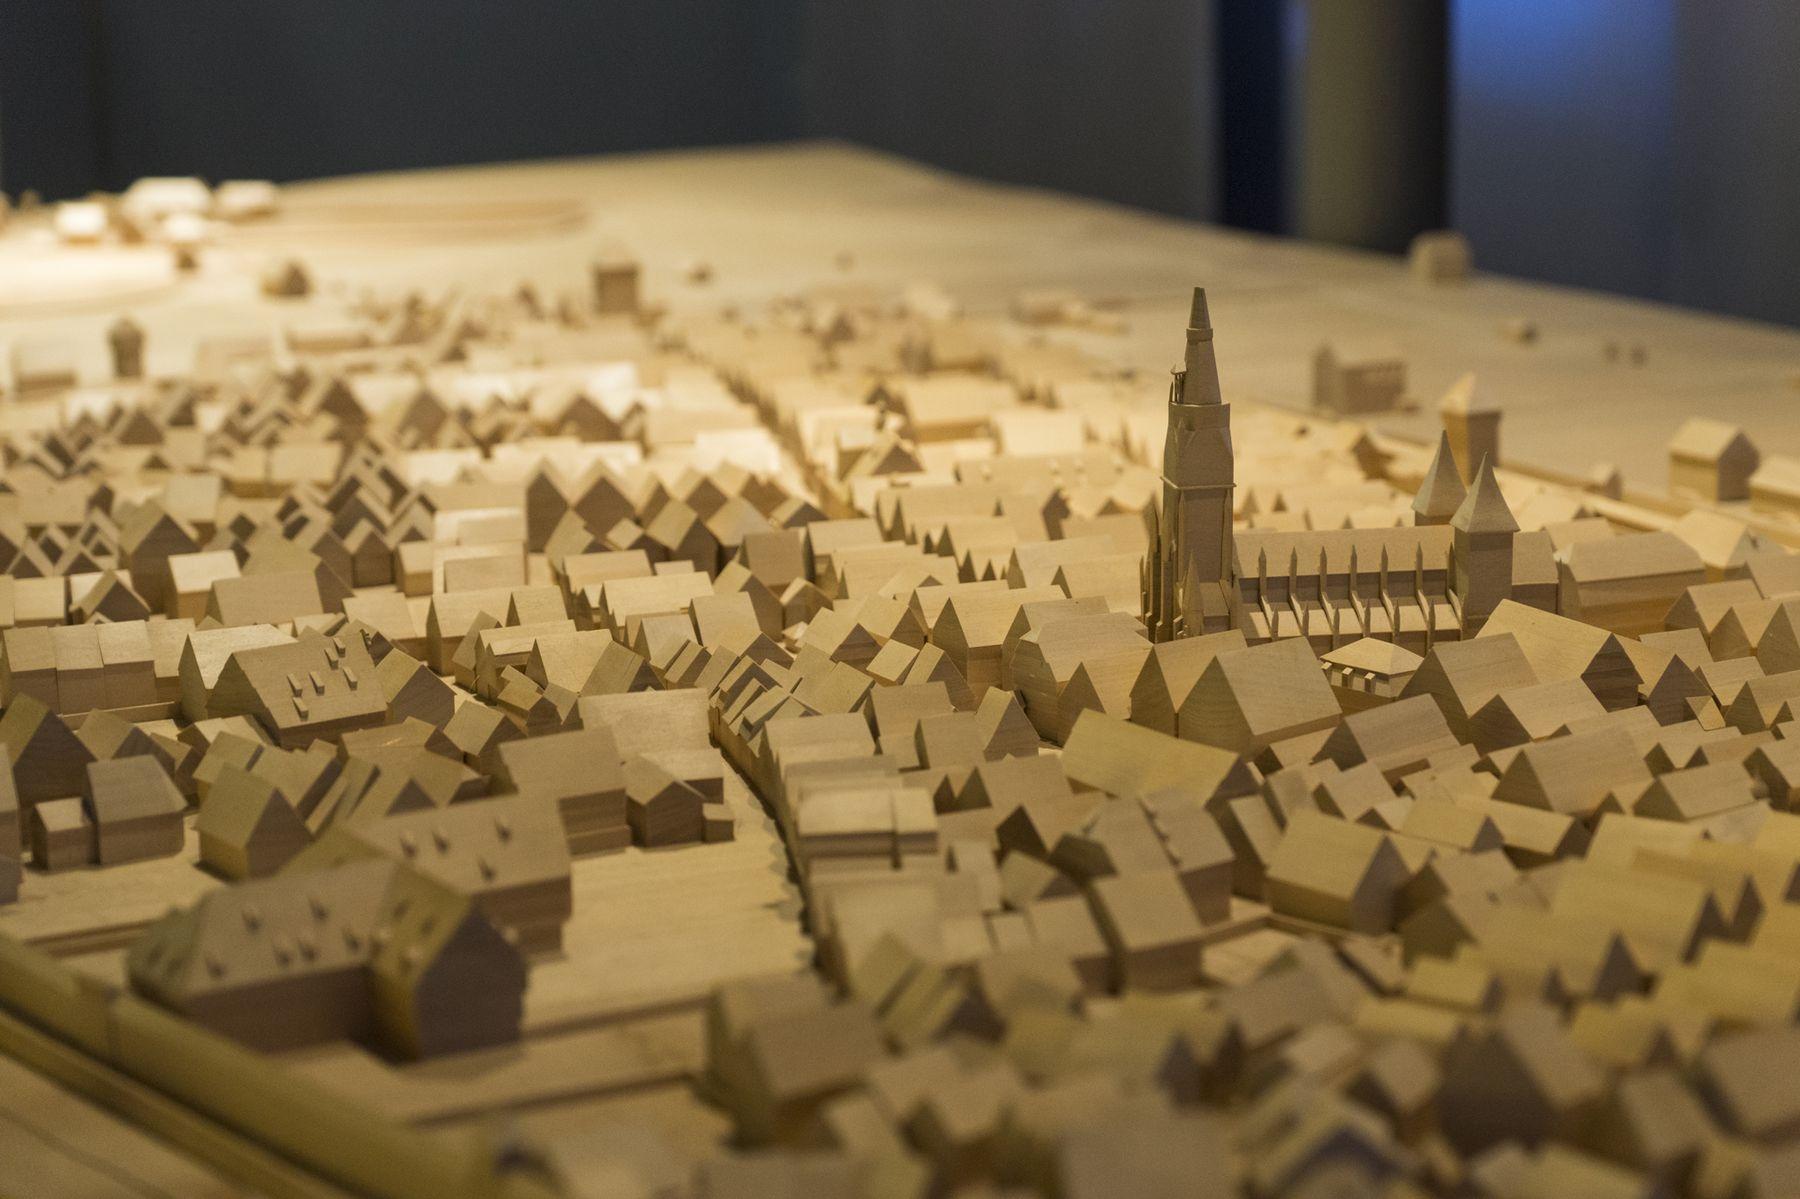 Heimatmuseum Reutlingen, Stadtmodell, Fotografin: Tina Kühnlein